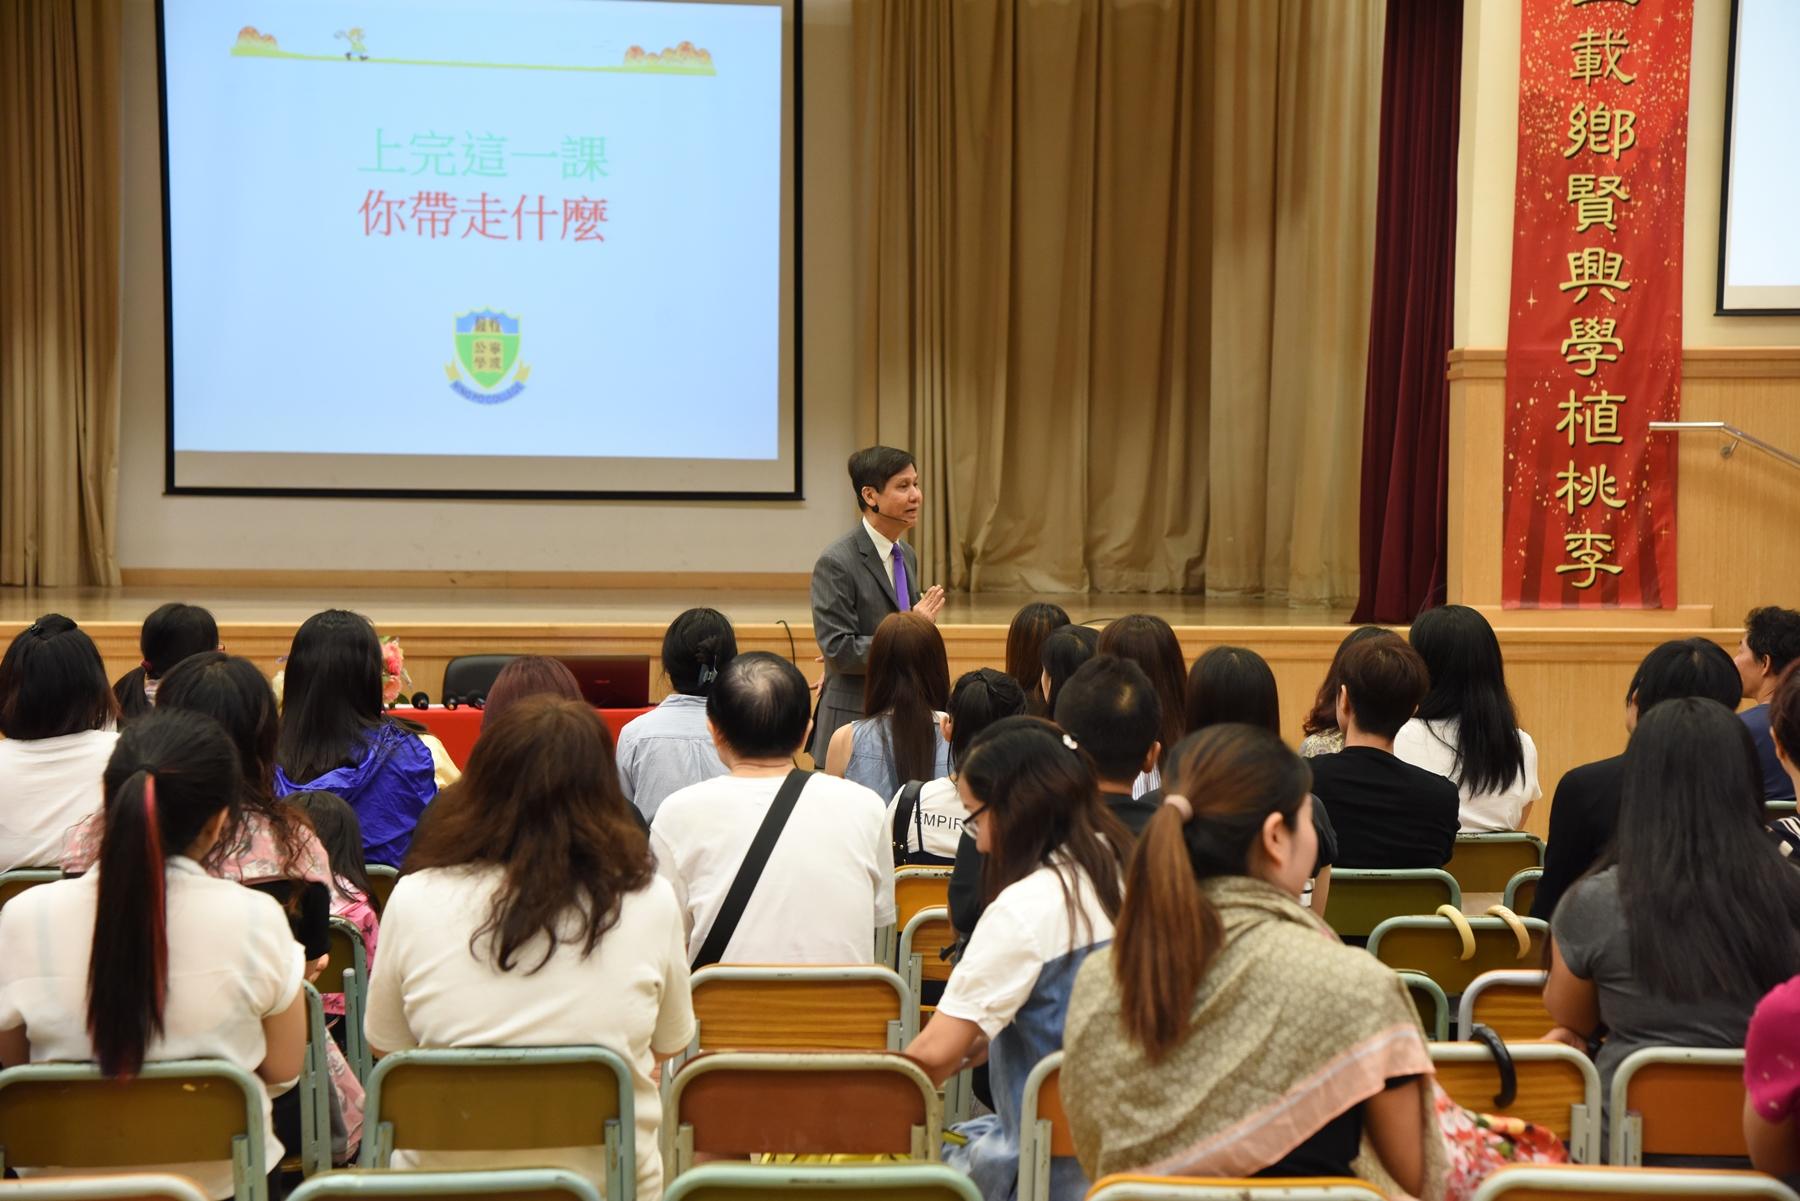 http://www.npc.edu.hk/sites/default/files/dsc_0106.jpg